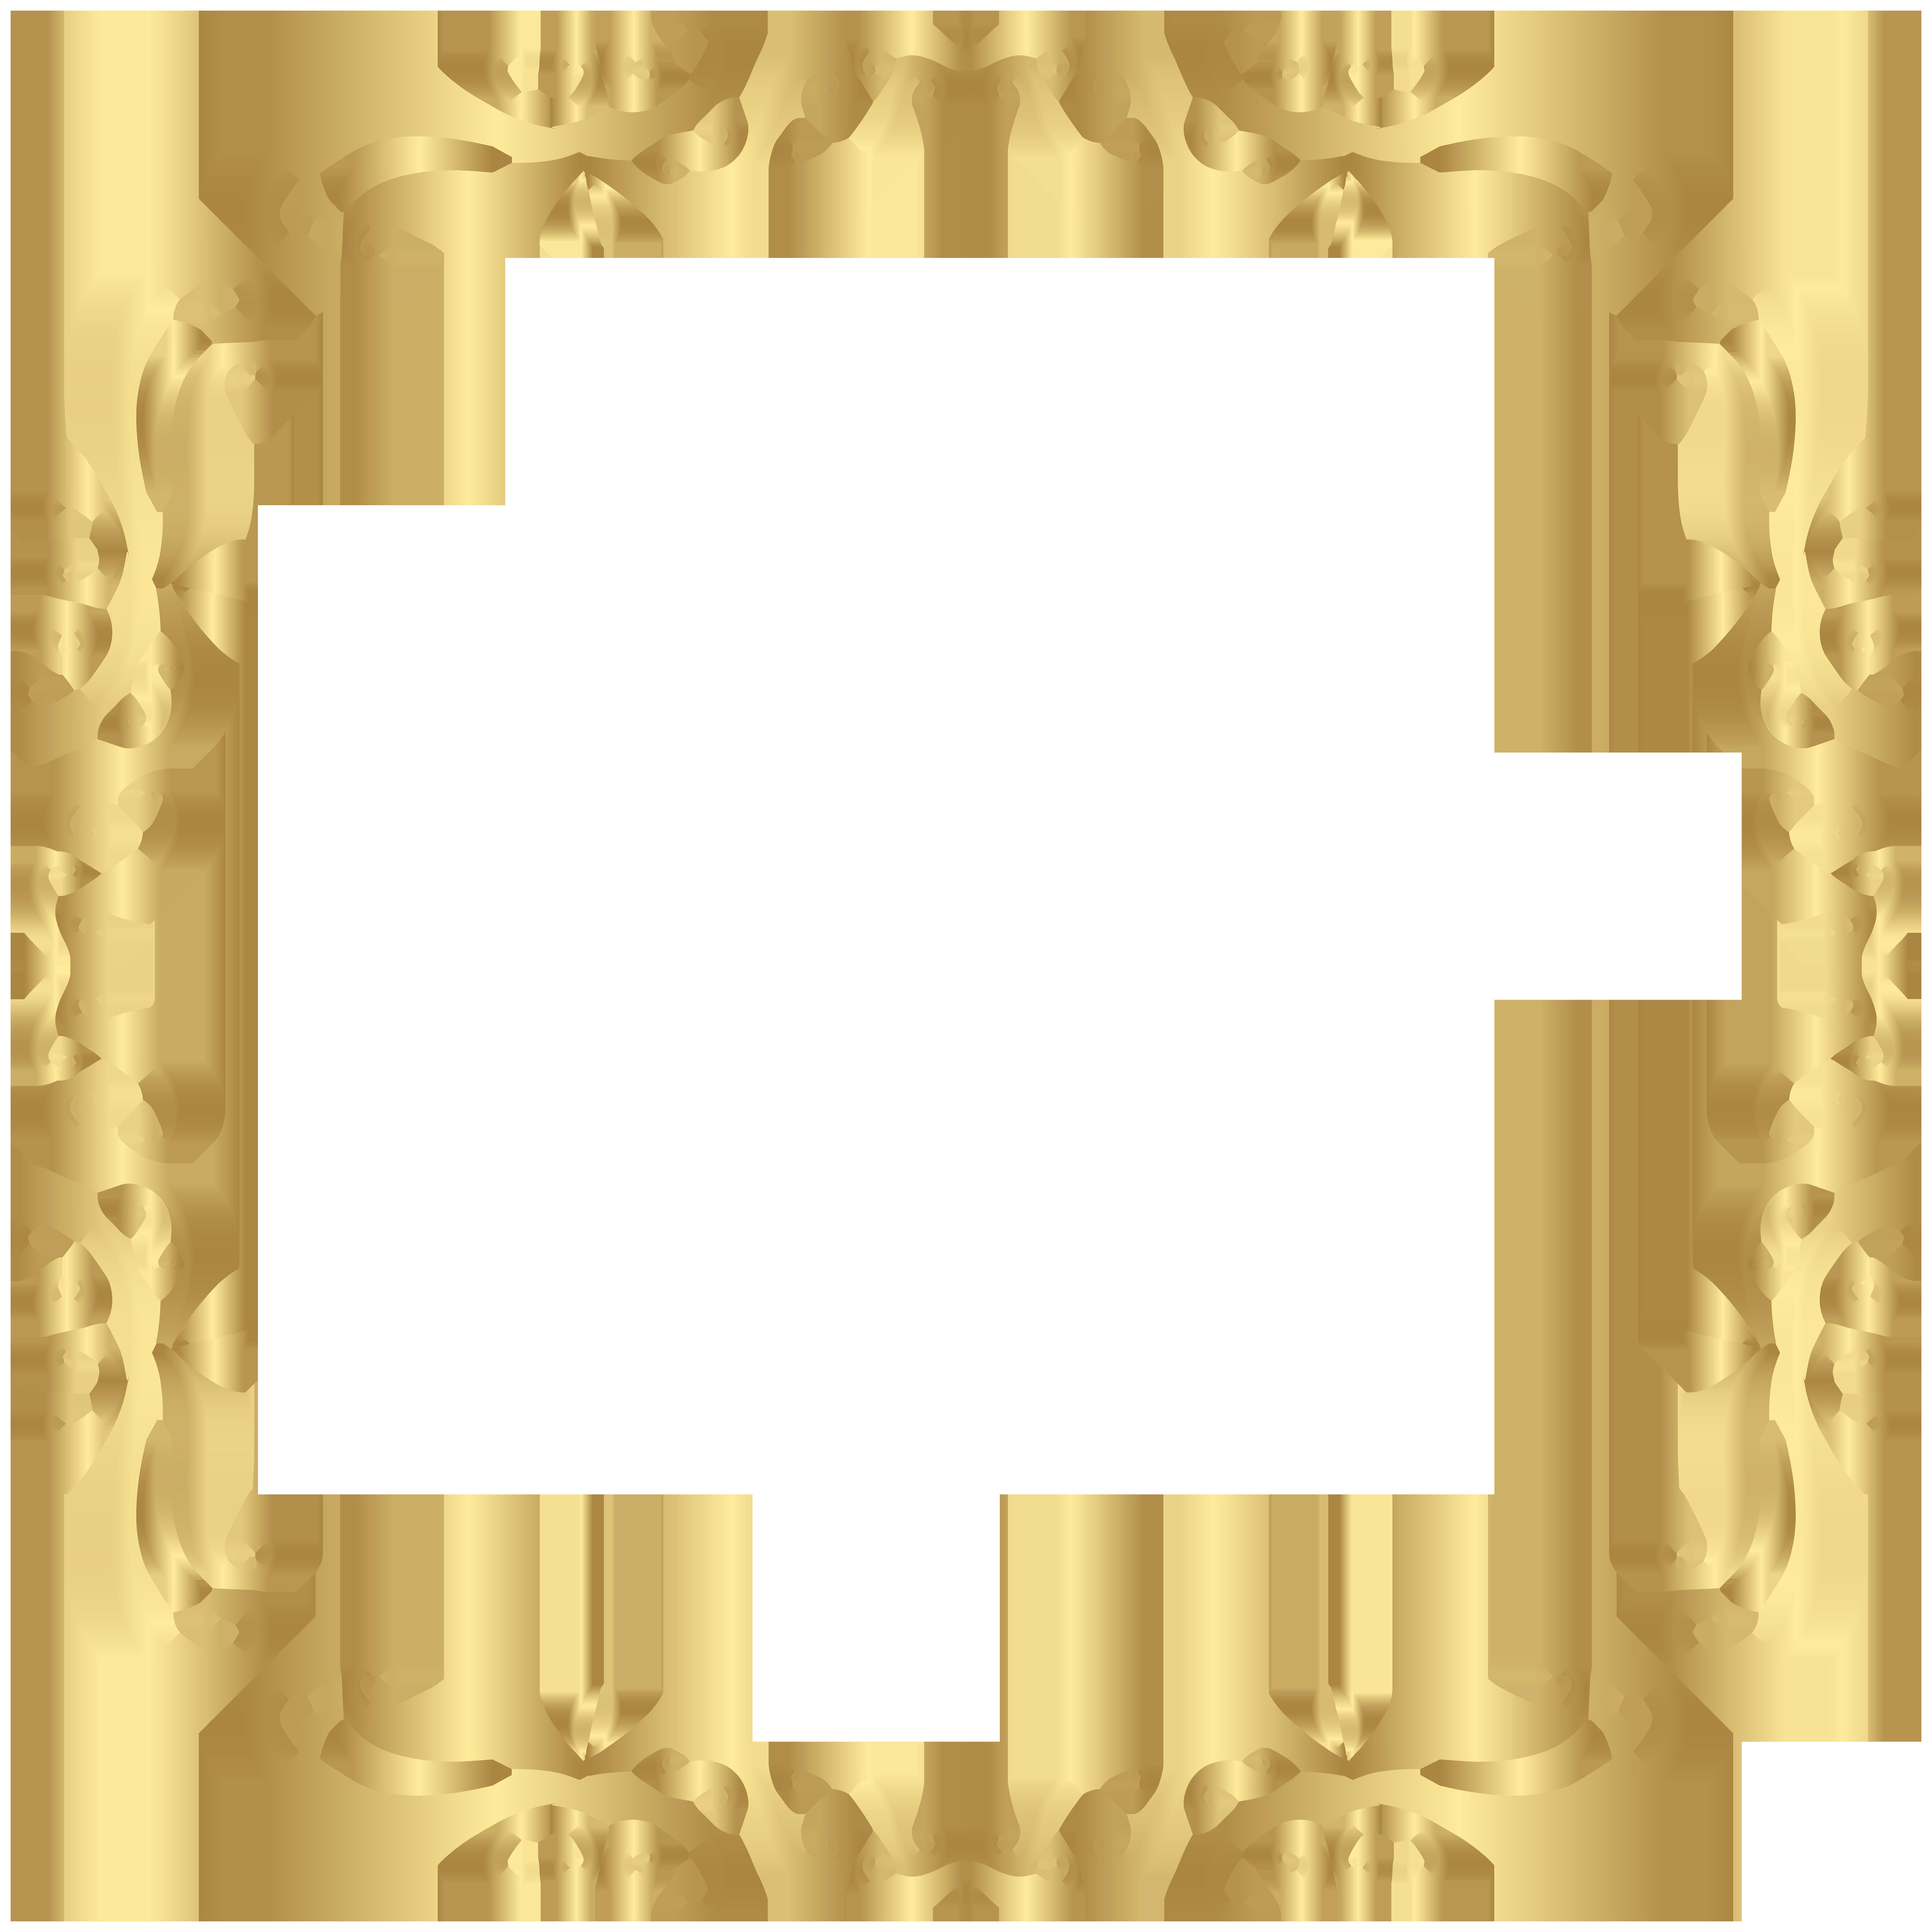 Decorative frame png. Border decor clip art